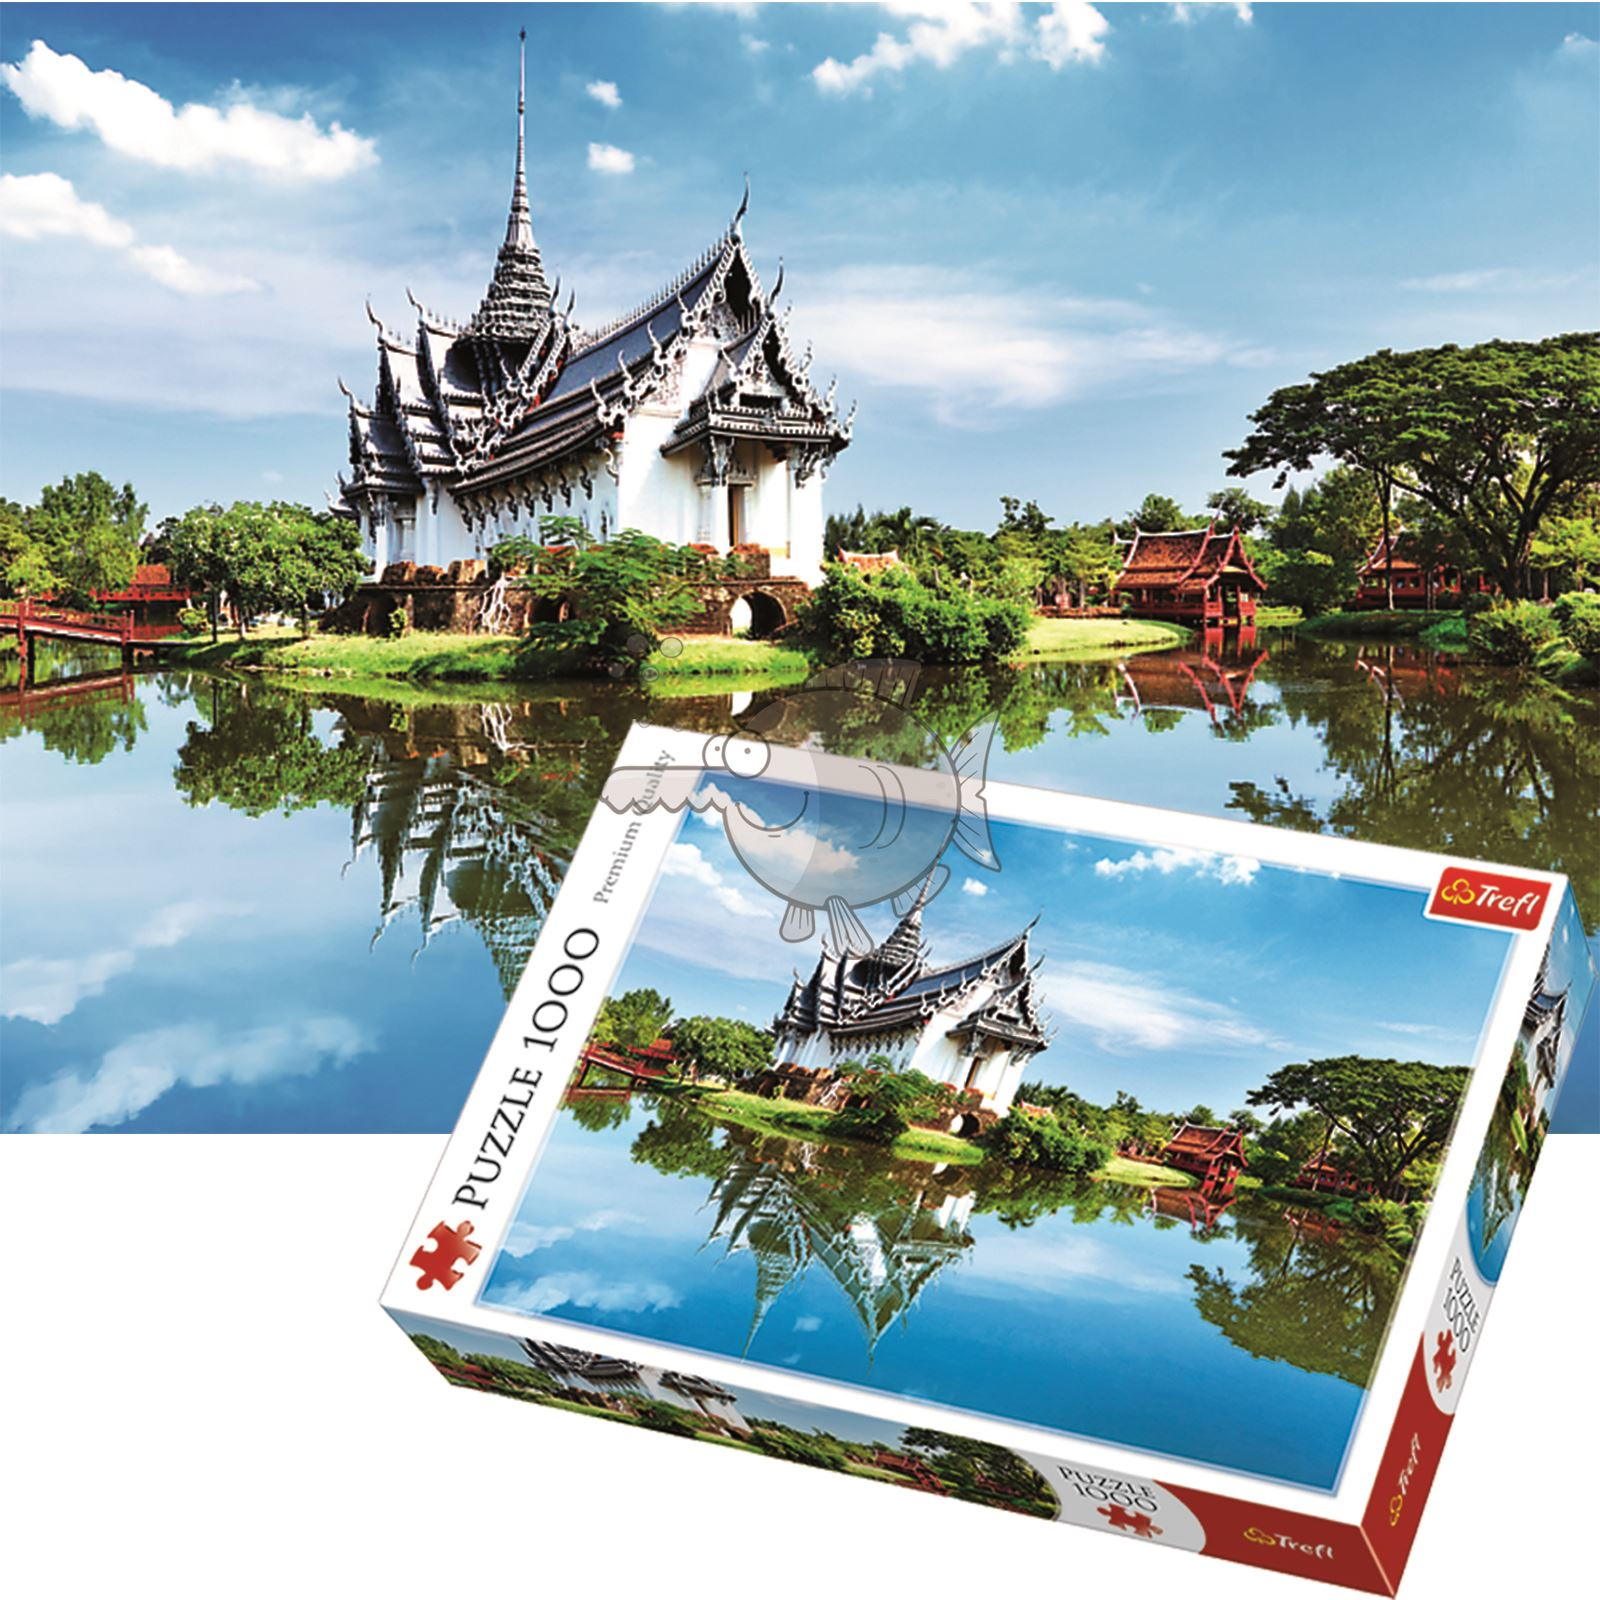 Trefl-300-500-1000-1500-2000-3000-4000-6000-Piece-Jigsaw-Puzzle-Landscapes-City thumbnail 312